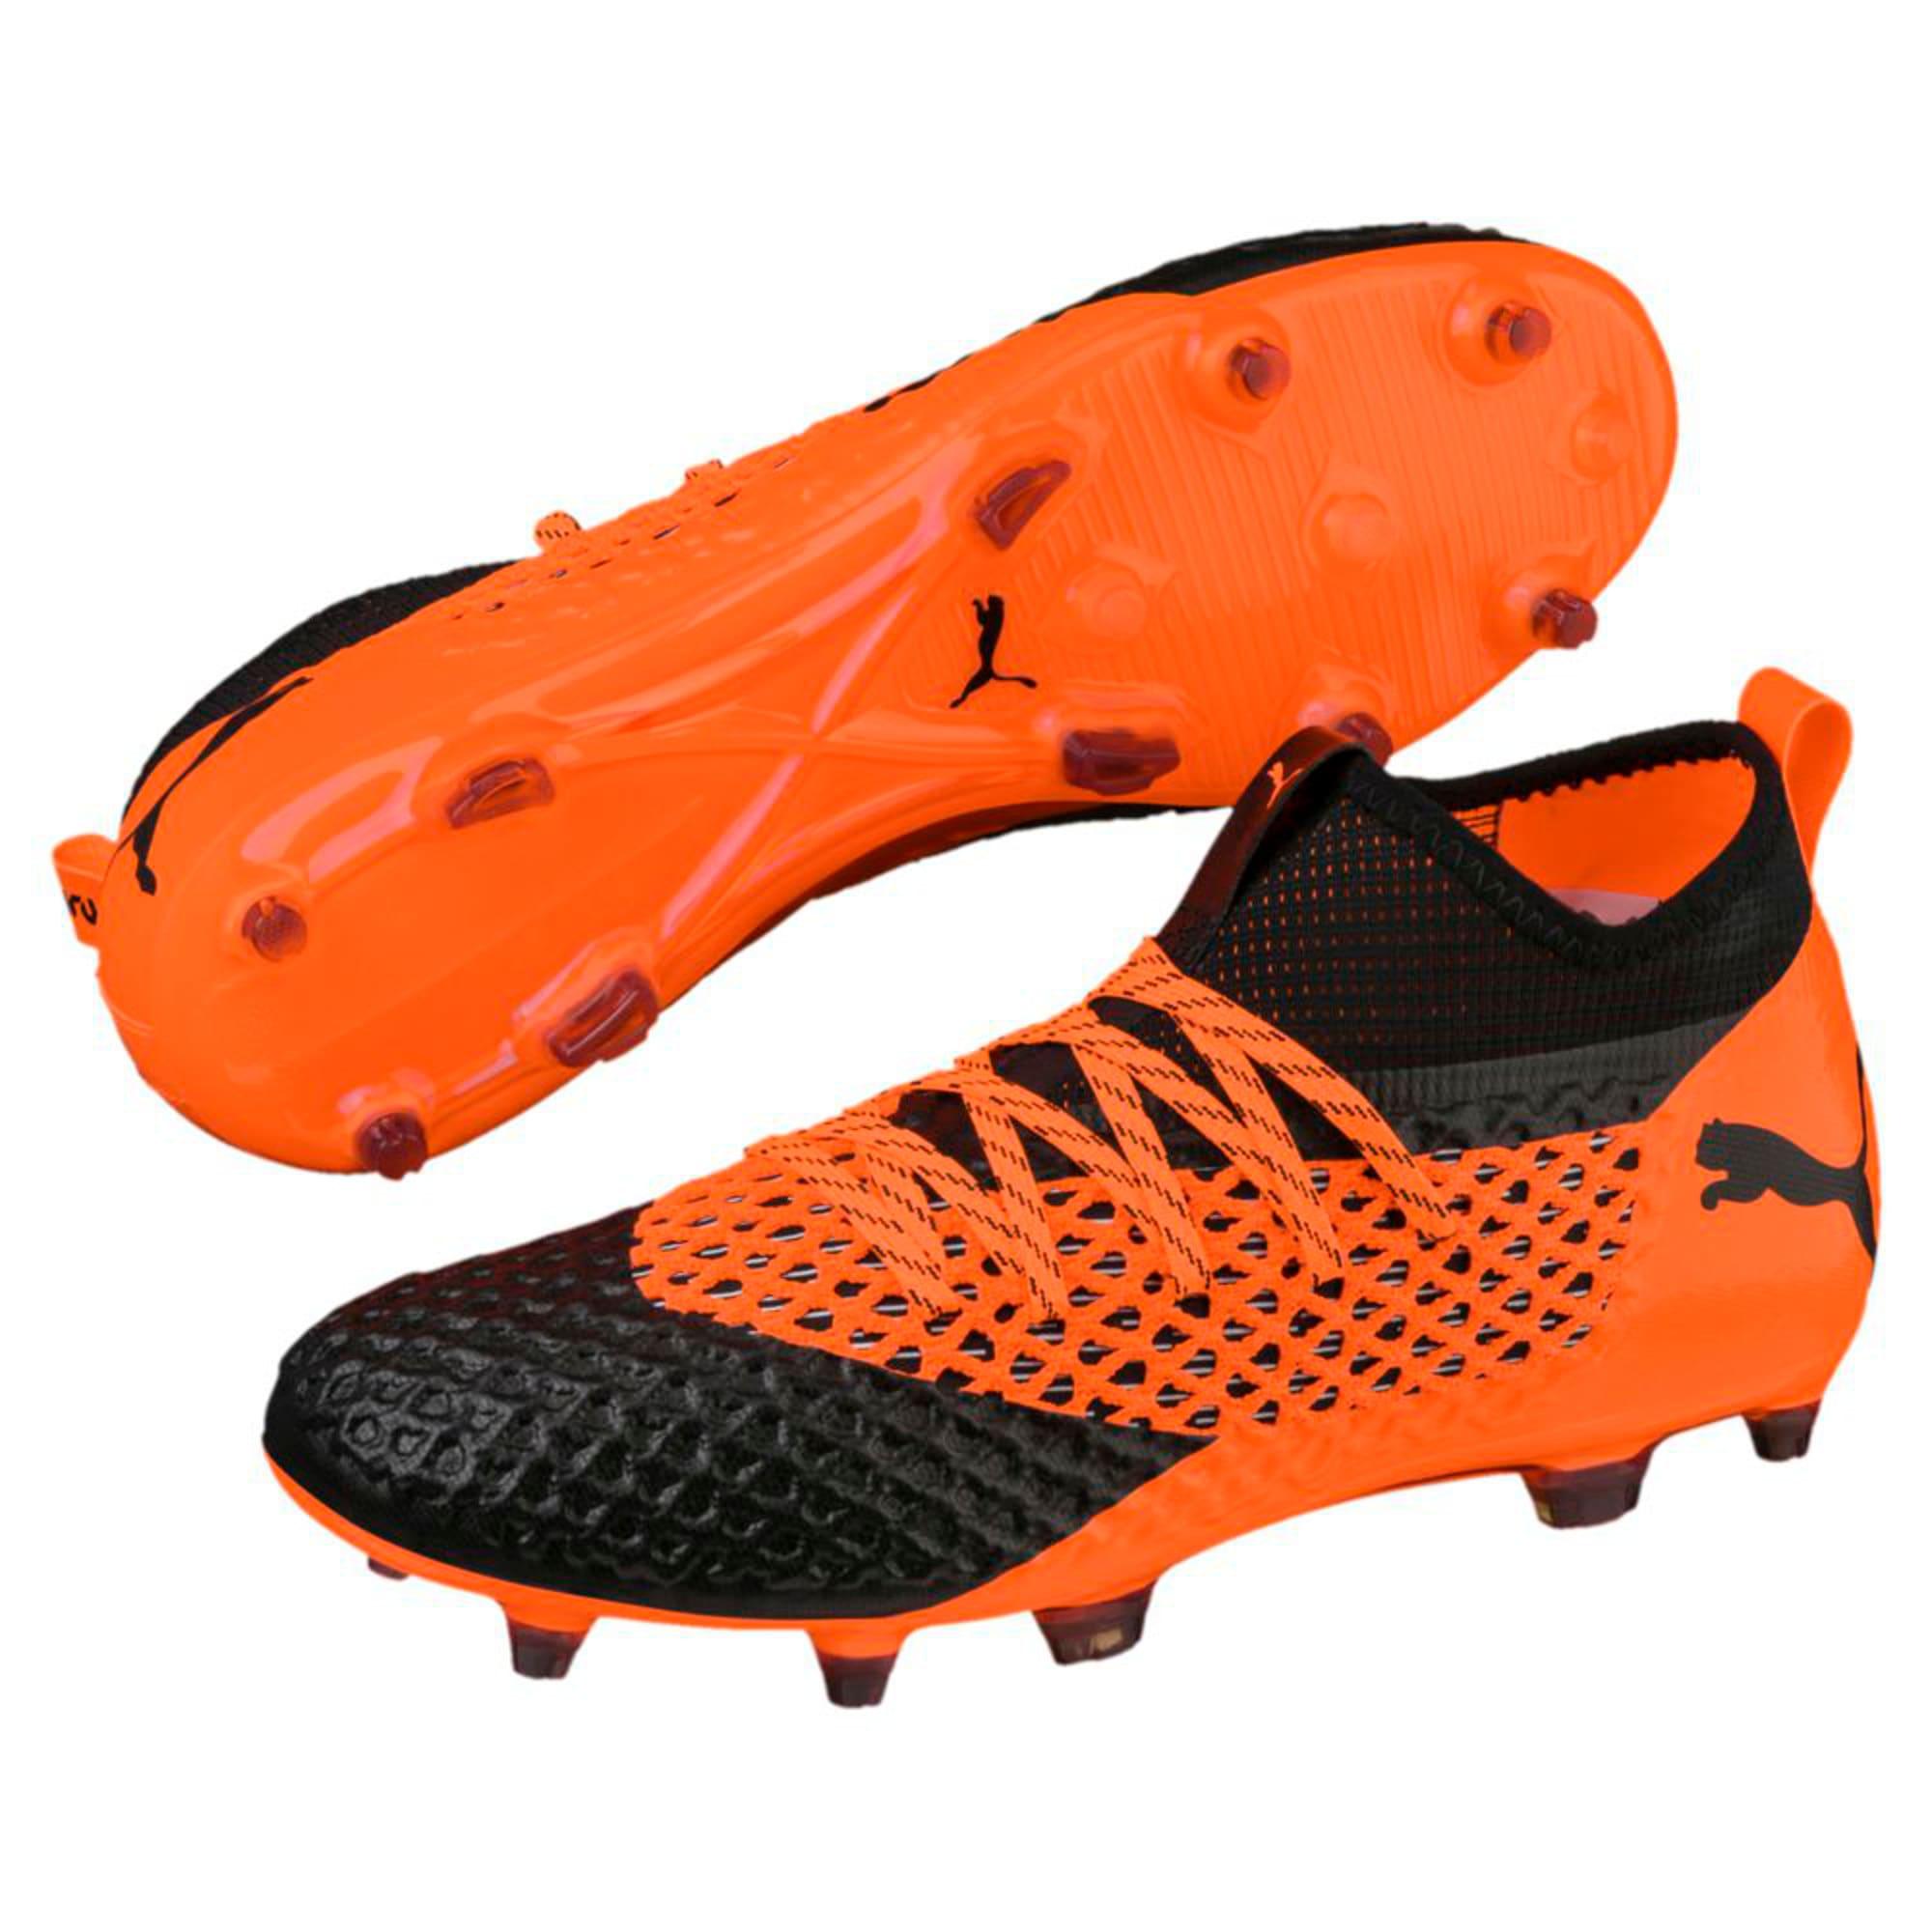 Thumbnail 6 of FUTURE 2.2 NETFIT FG/AG  Football Boots, Black-Orange, medium-IND